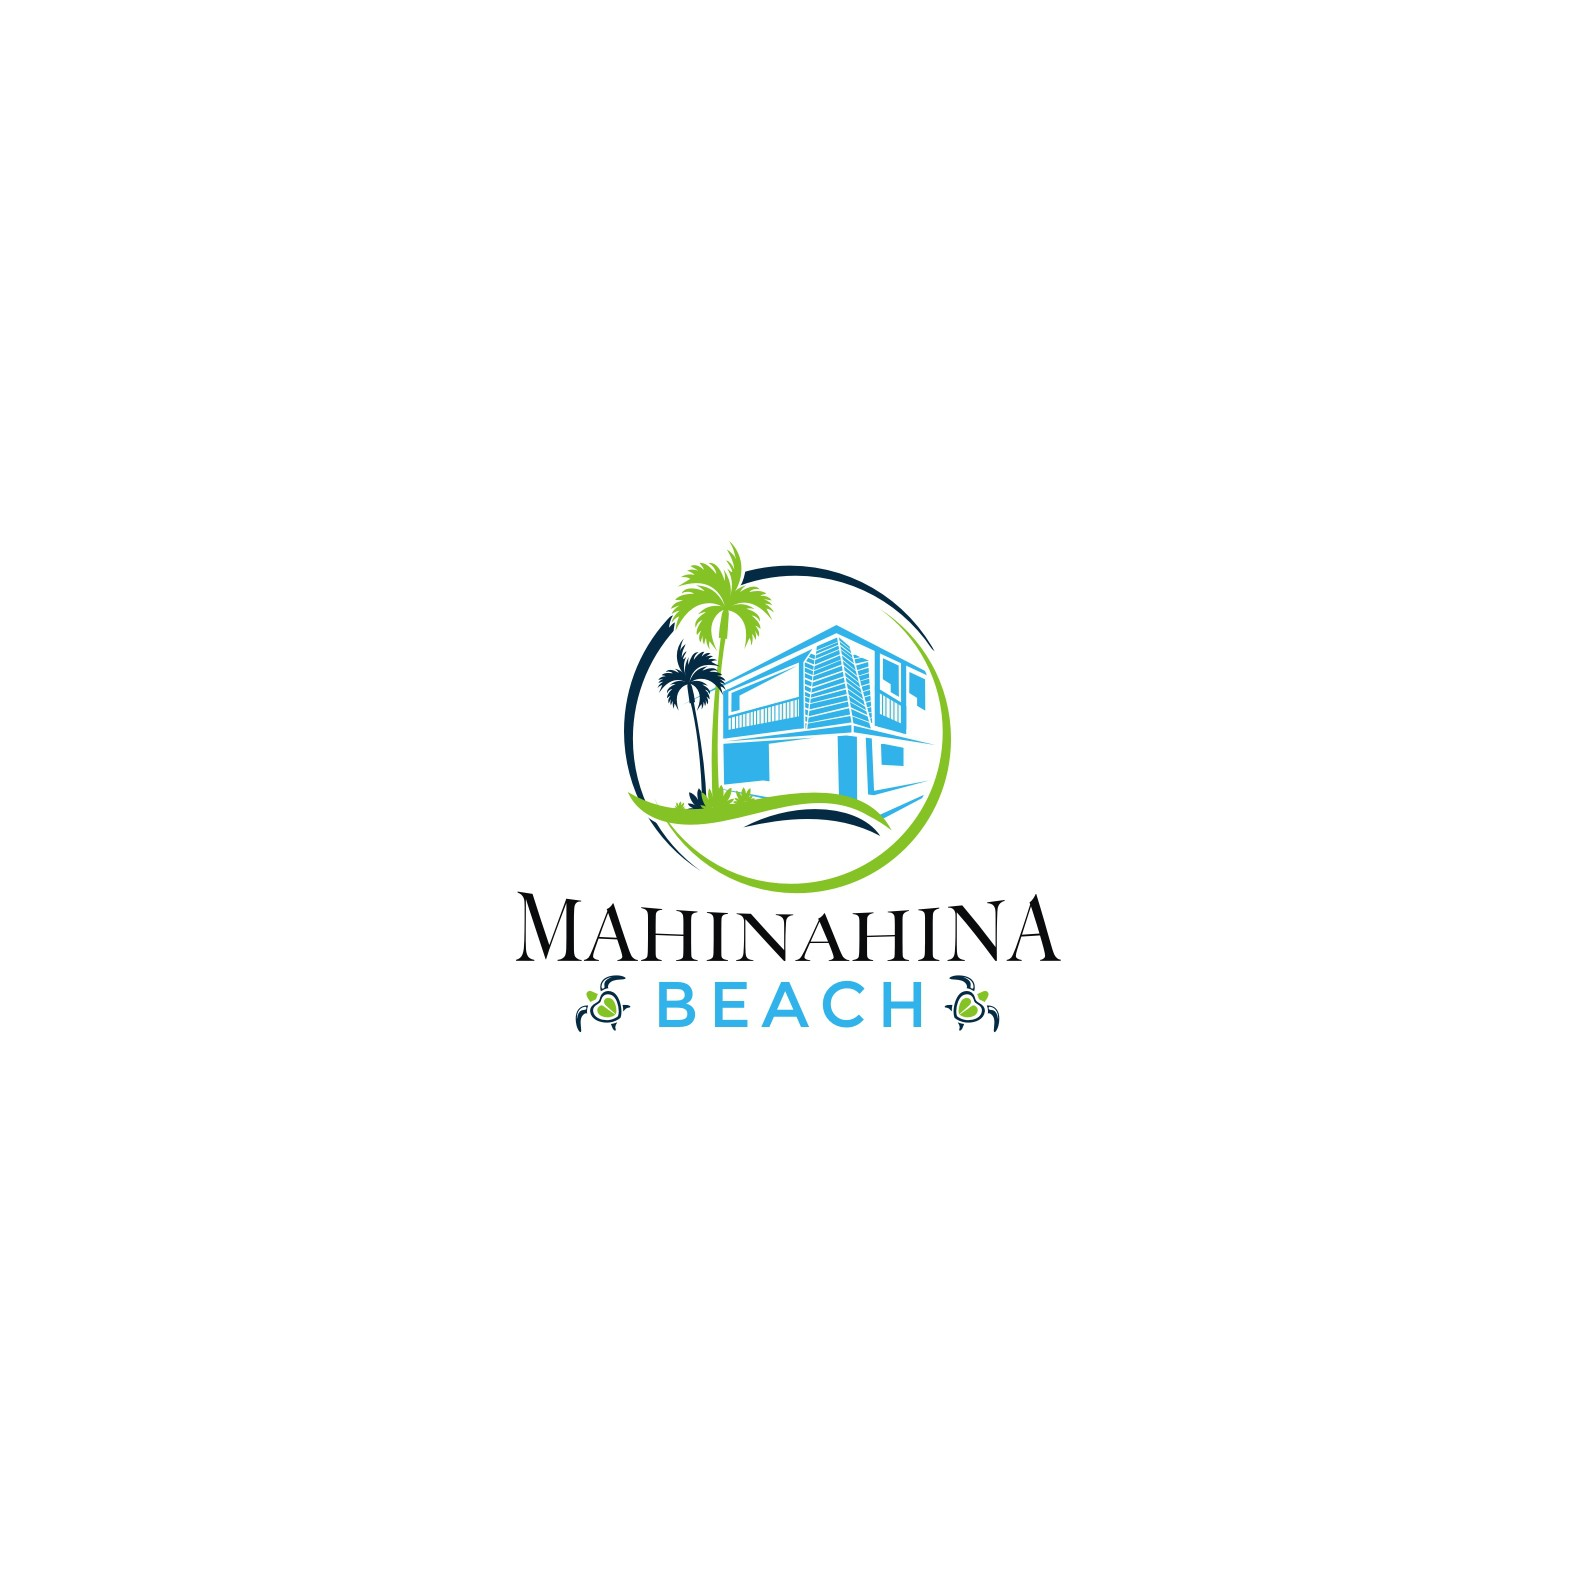 Classic Maui style logo with a modern flair!